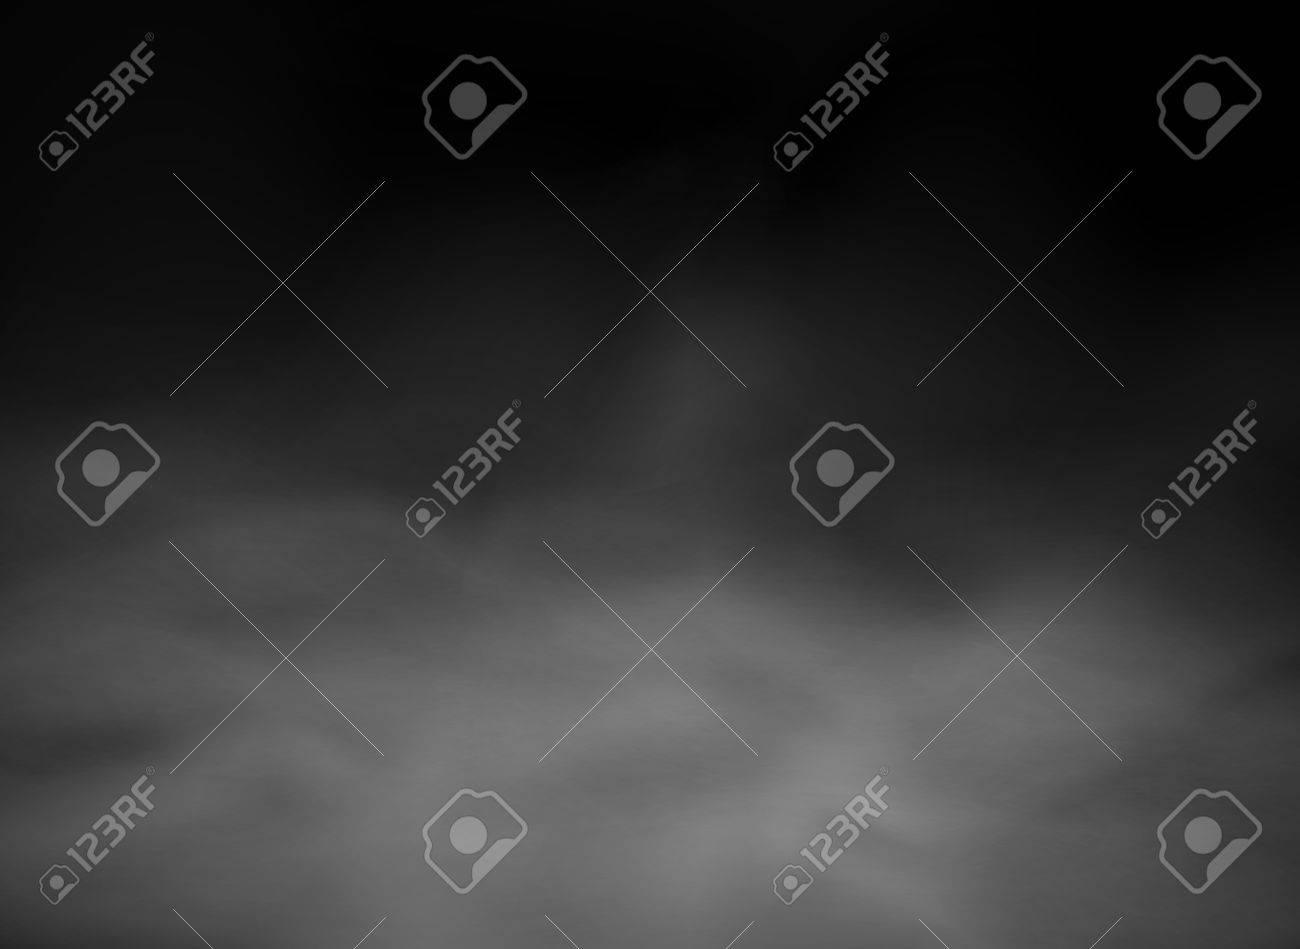 smoke vector backgrounds abstract unusual - 54276613